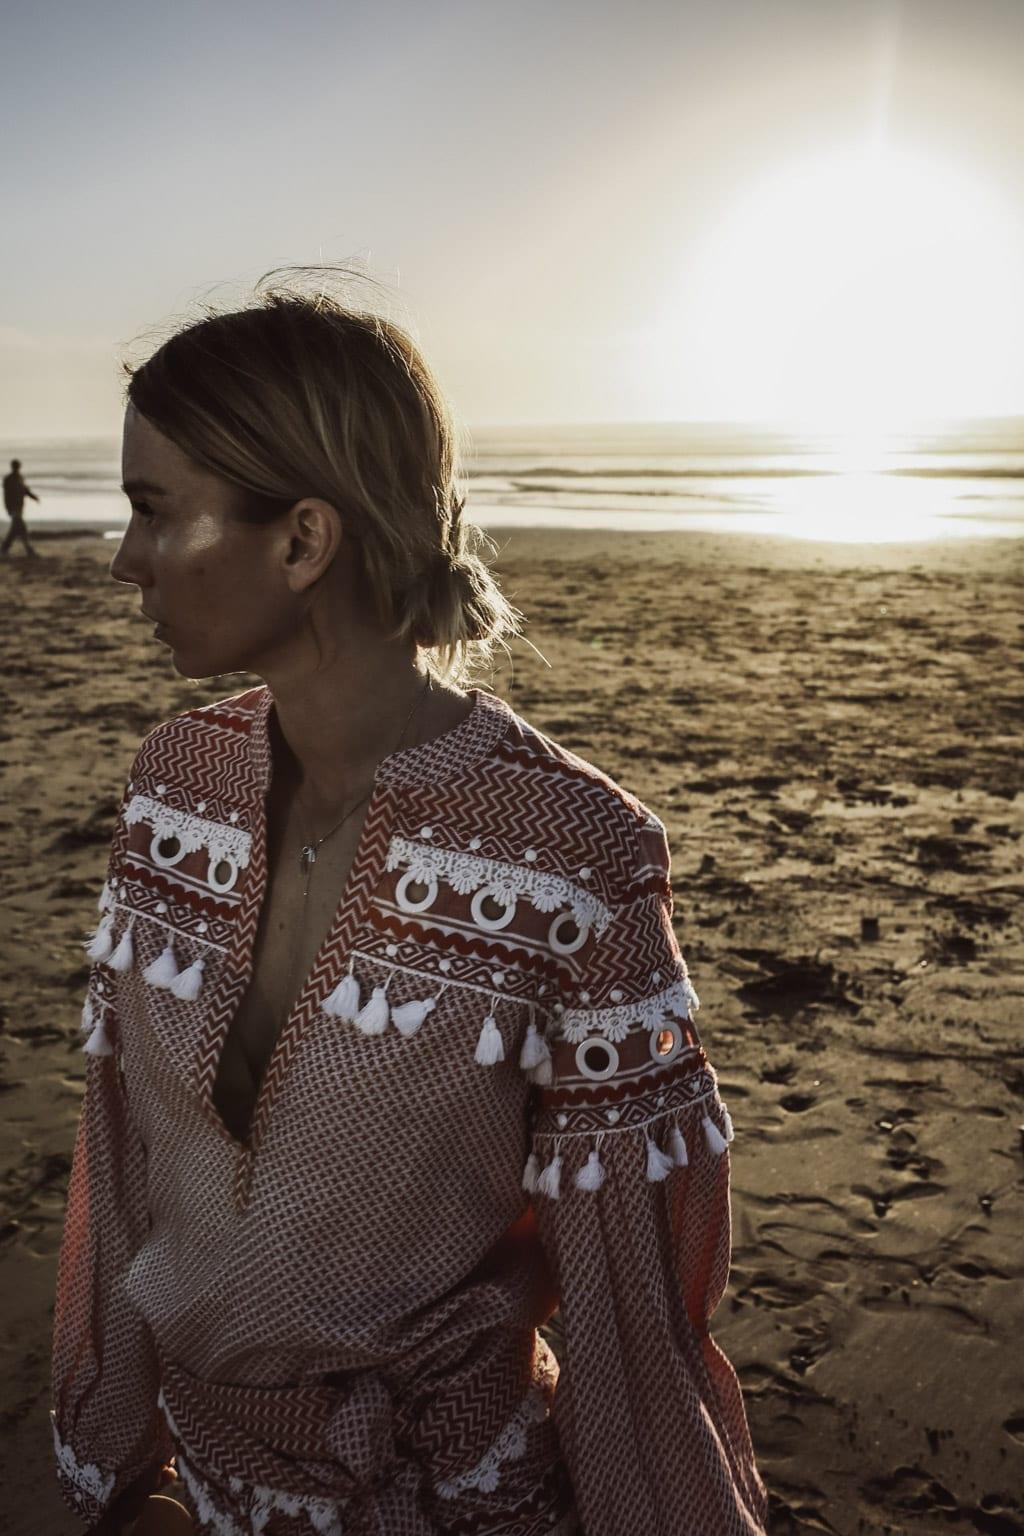 Karin Kaswurm am Strand von Agadir, Marokko